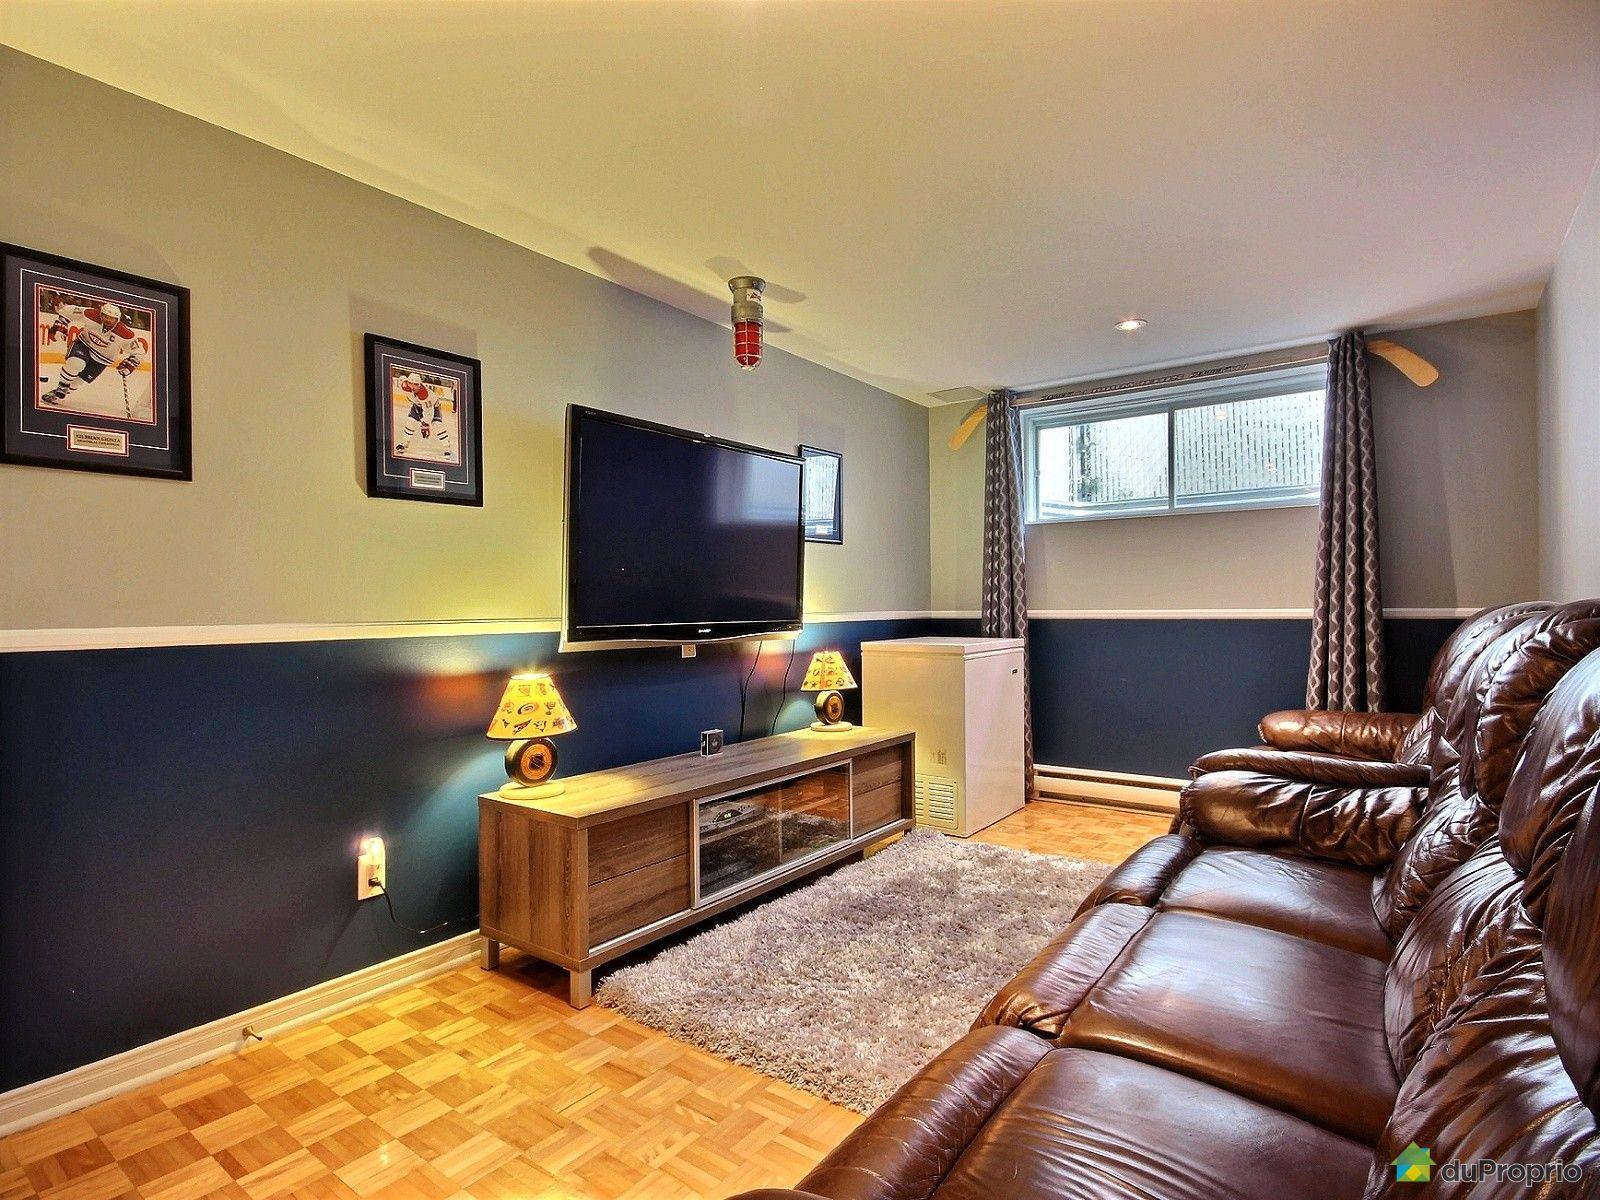 House For Sale In Le Gardeur 282 Rue Desparois Duproprio 648462